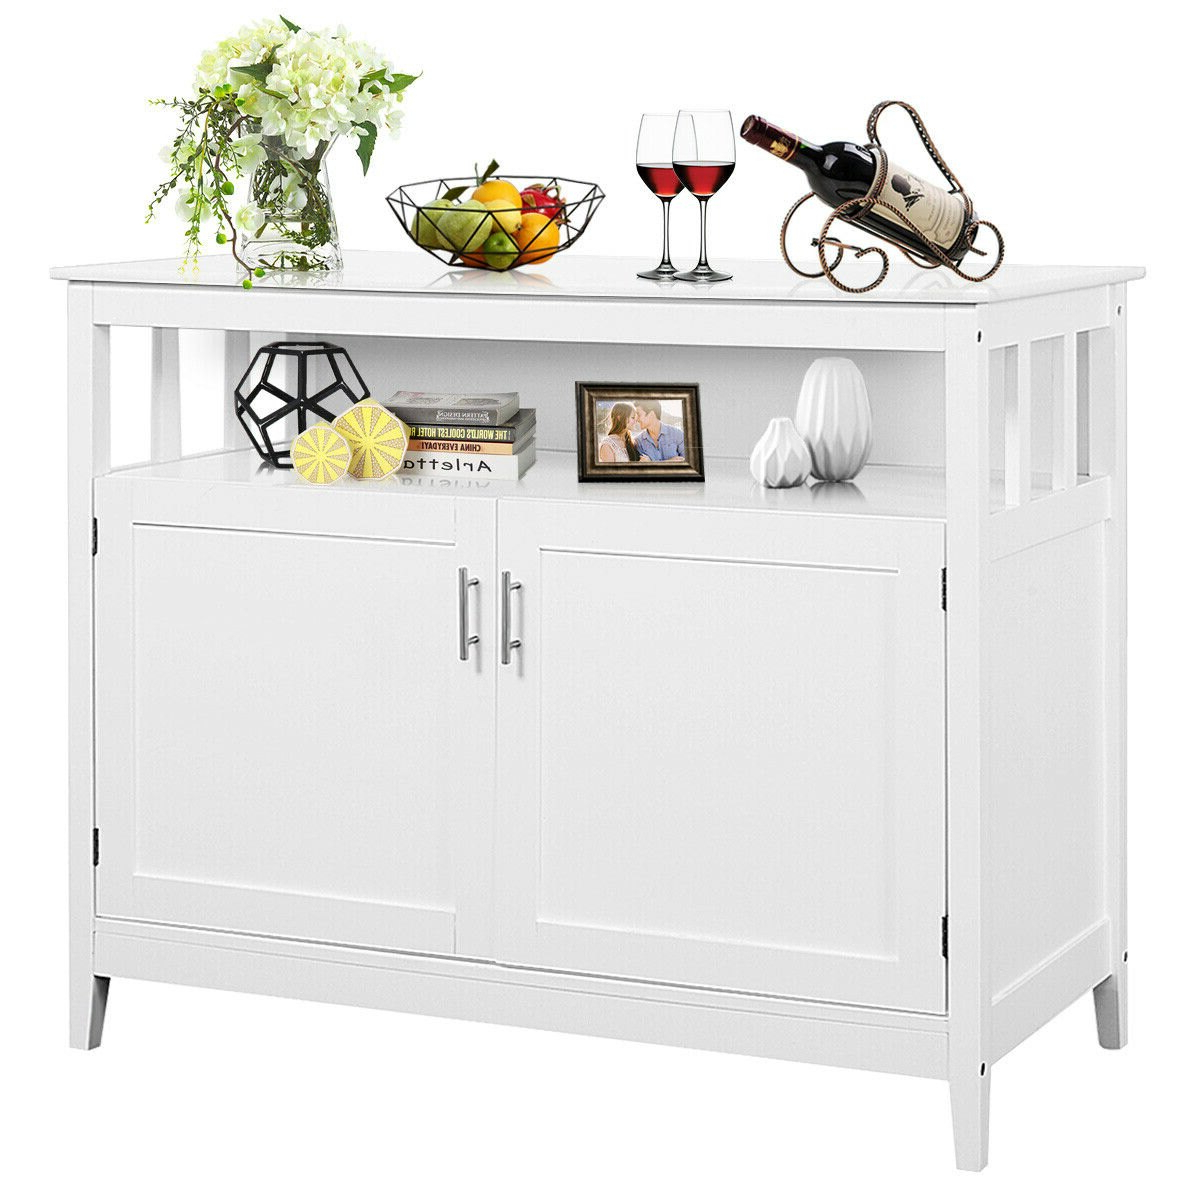 Costway: Costway Modern Kitchen Storage Cabinet Buffet Server Table Sideboard Dining Wood White | Rakuten With Regard To Modern Espresso Storage Buffets (View 20 of 20)